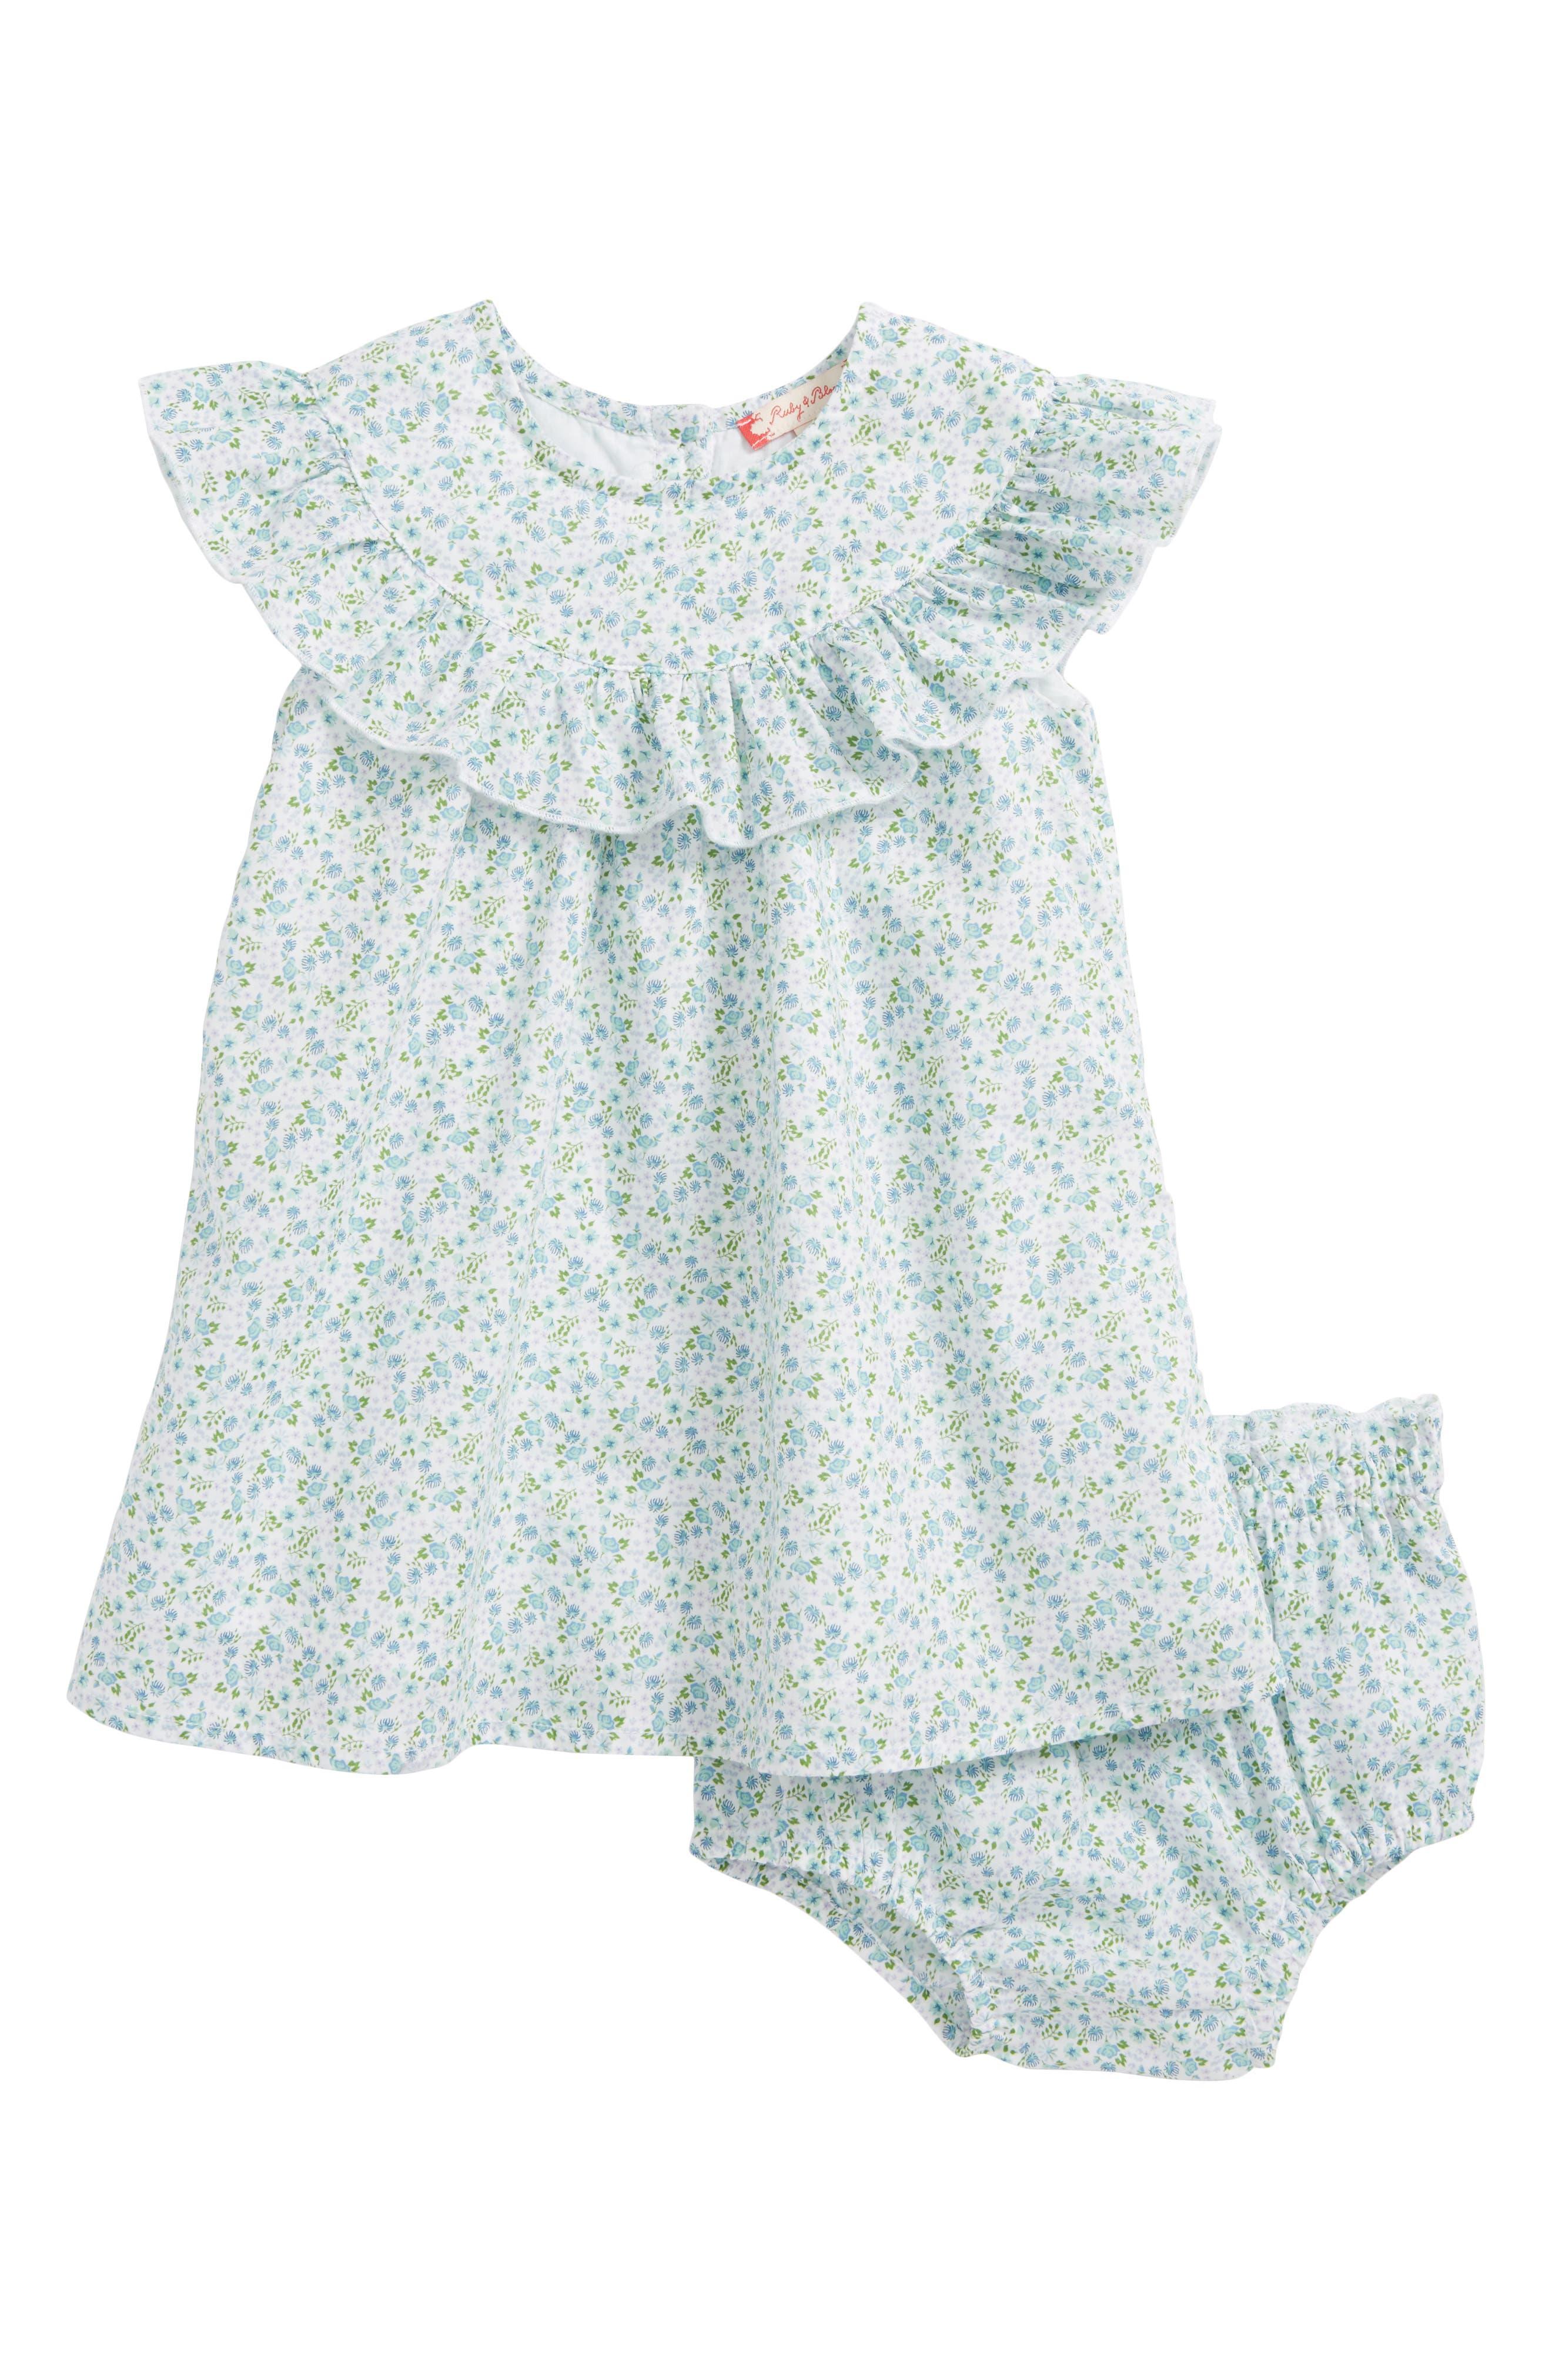 Ruffle Dress,                             Main thumbnail 1, color,                             100